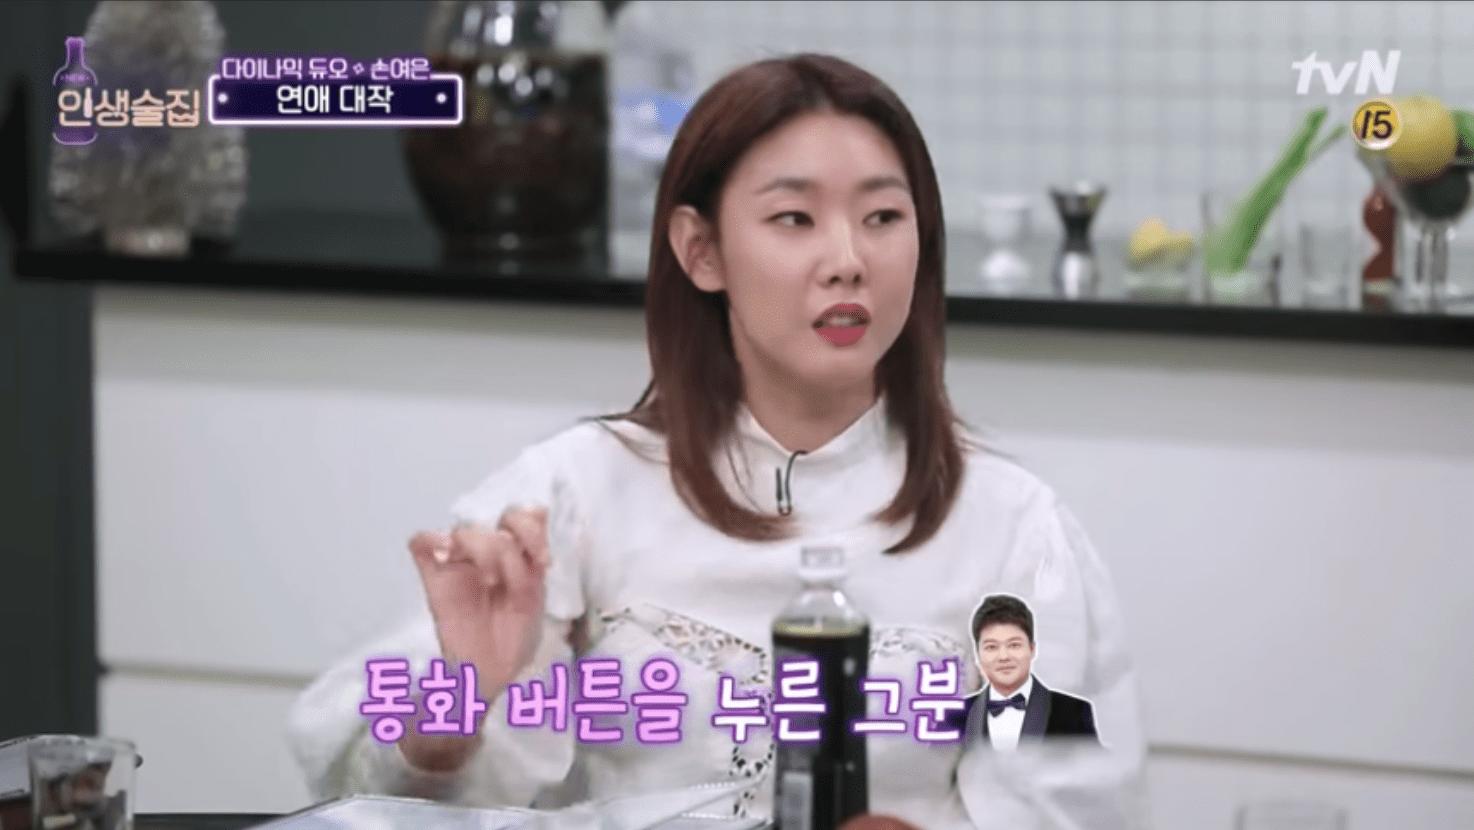 Jun hyun moo dating apps